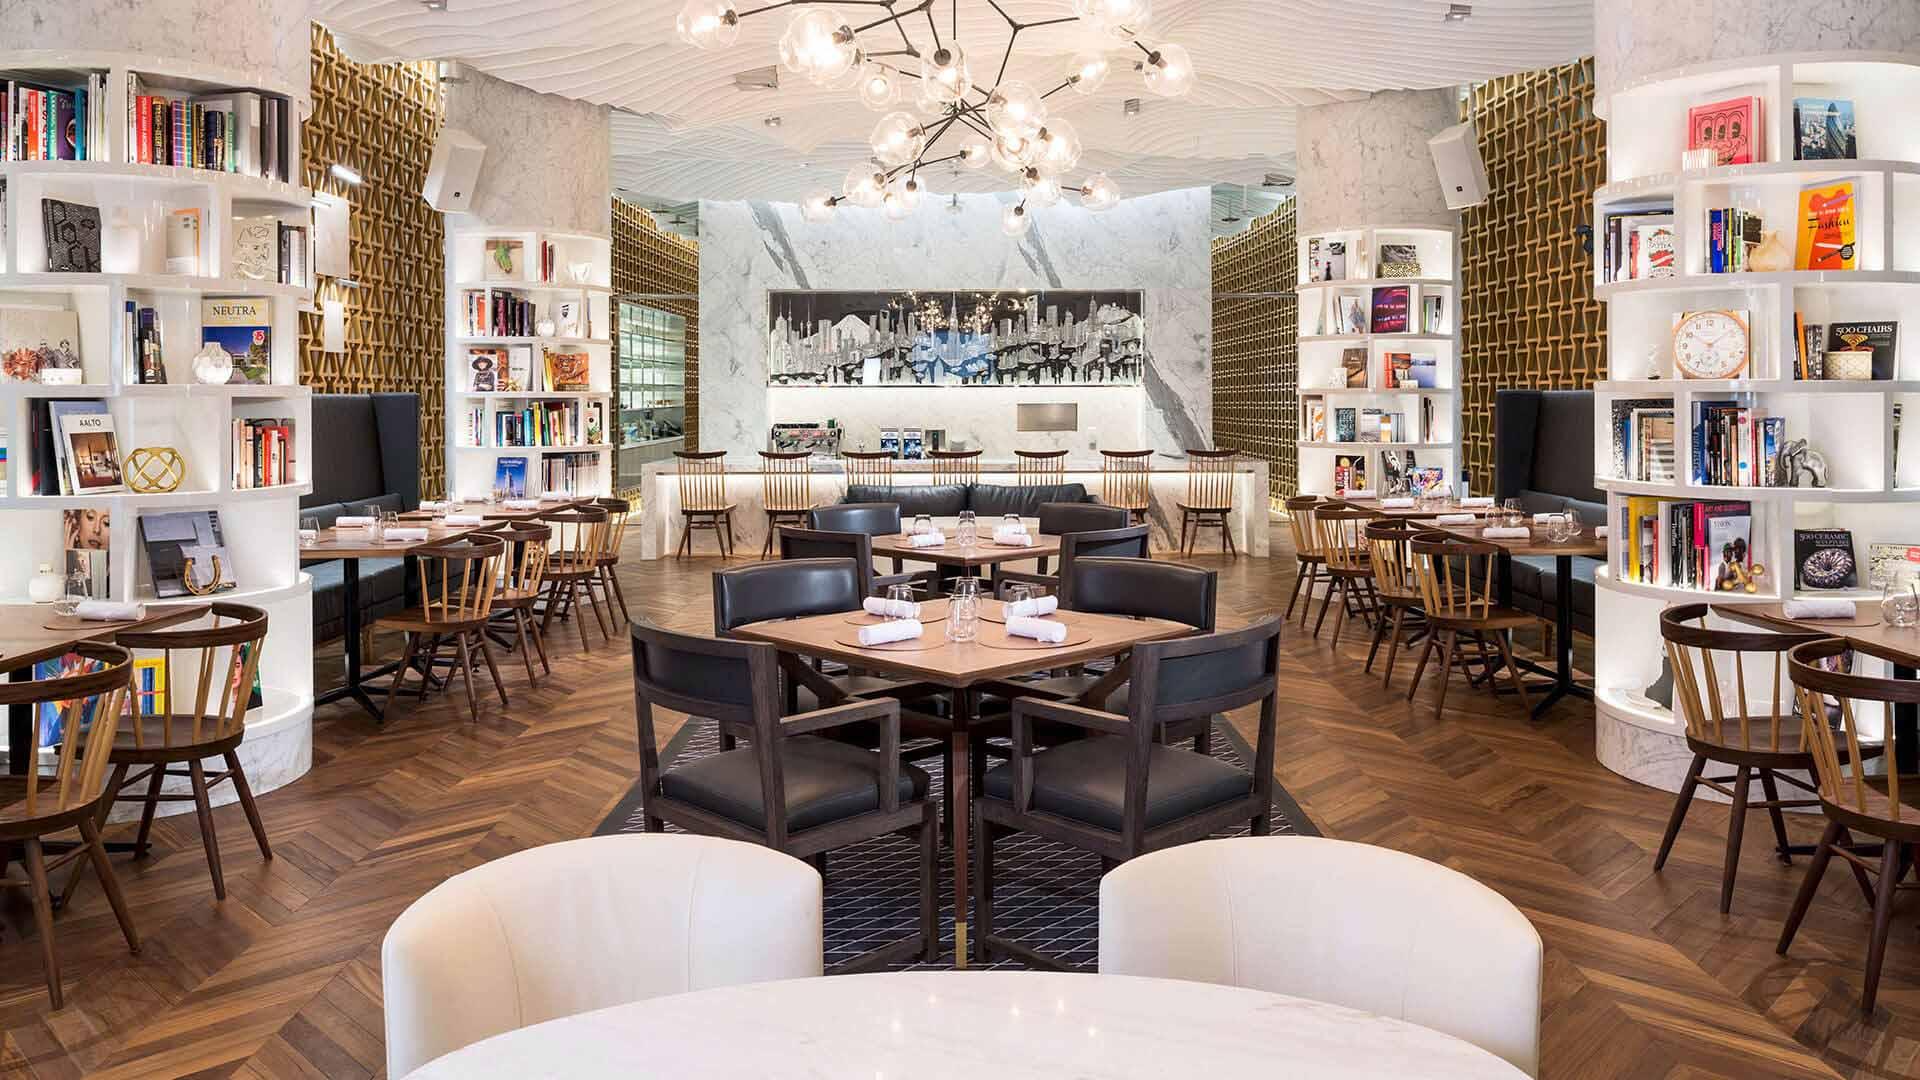 2018 lexus lounge intersect gallery03